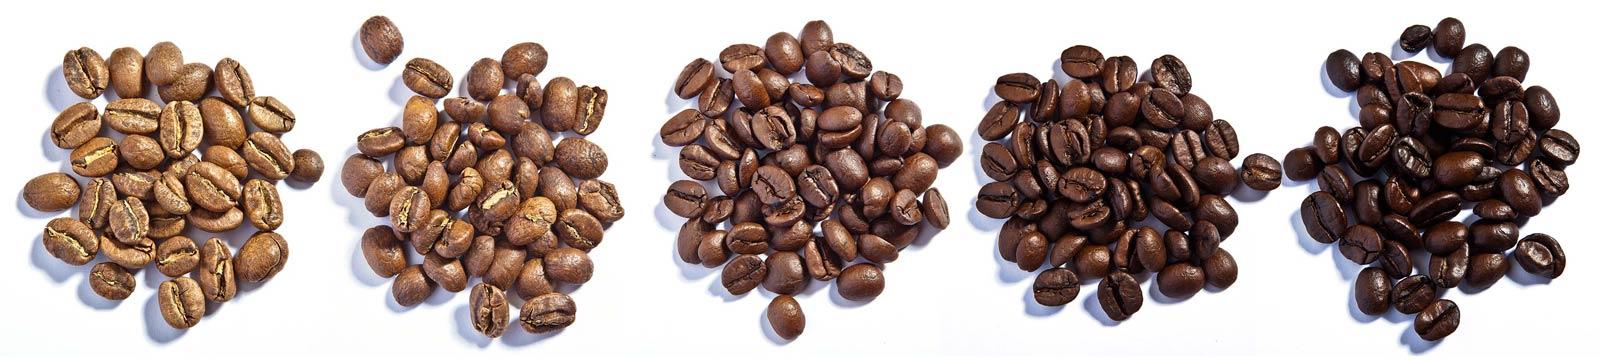 Craft Coffee Roast Levels